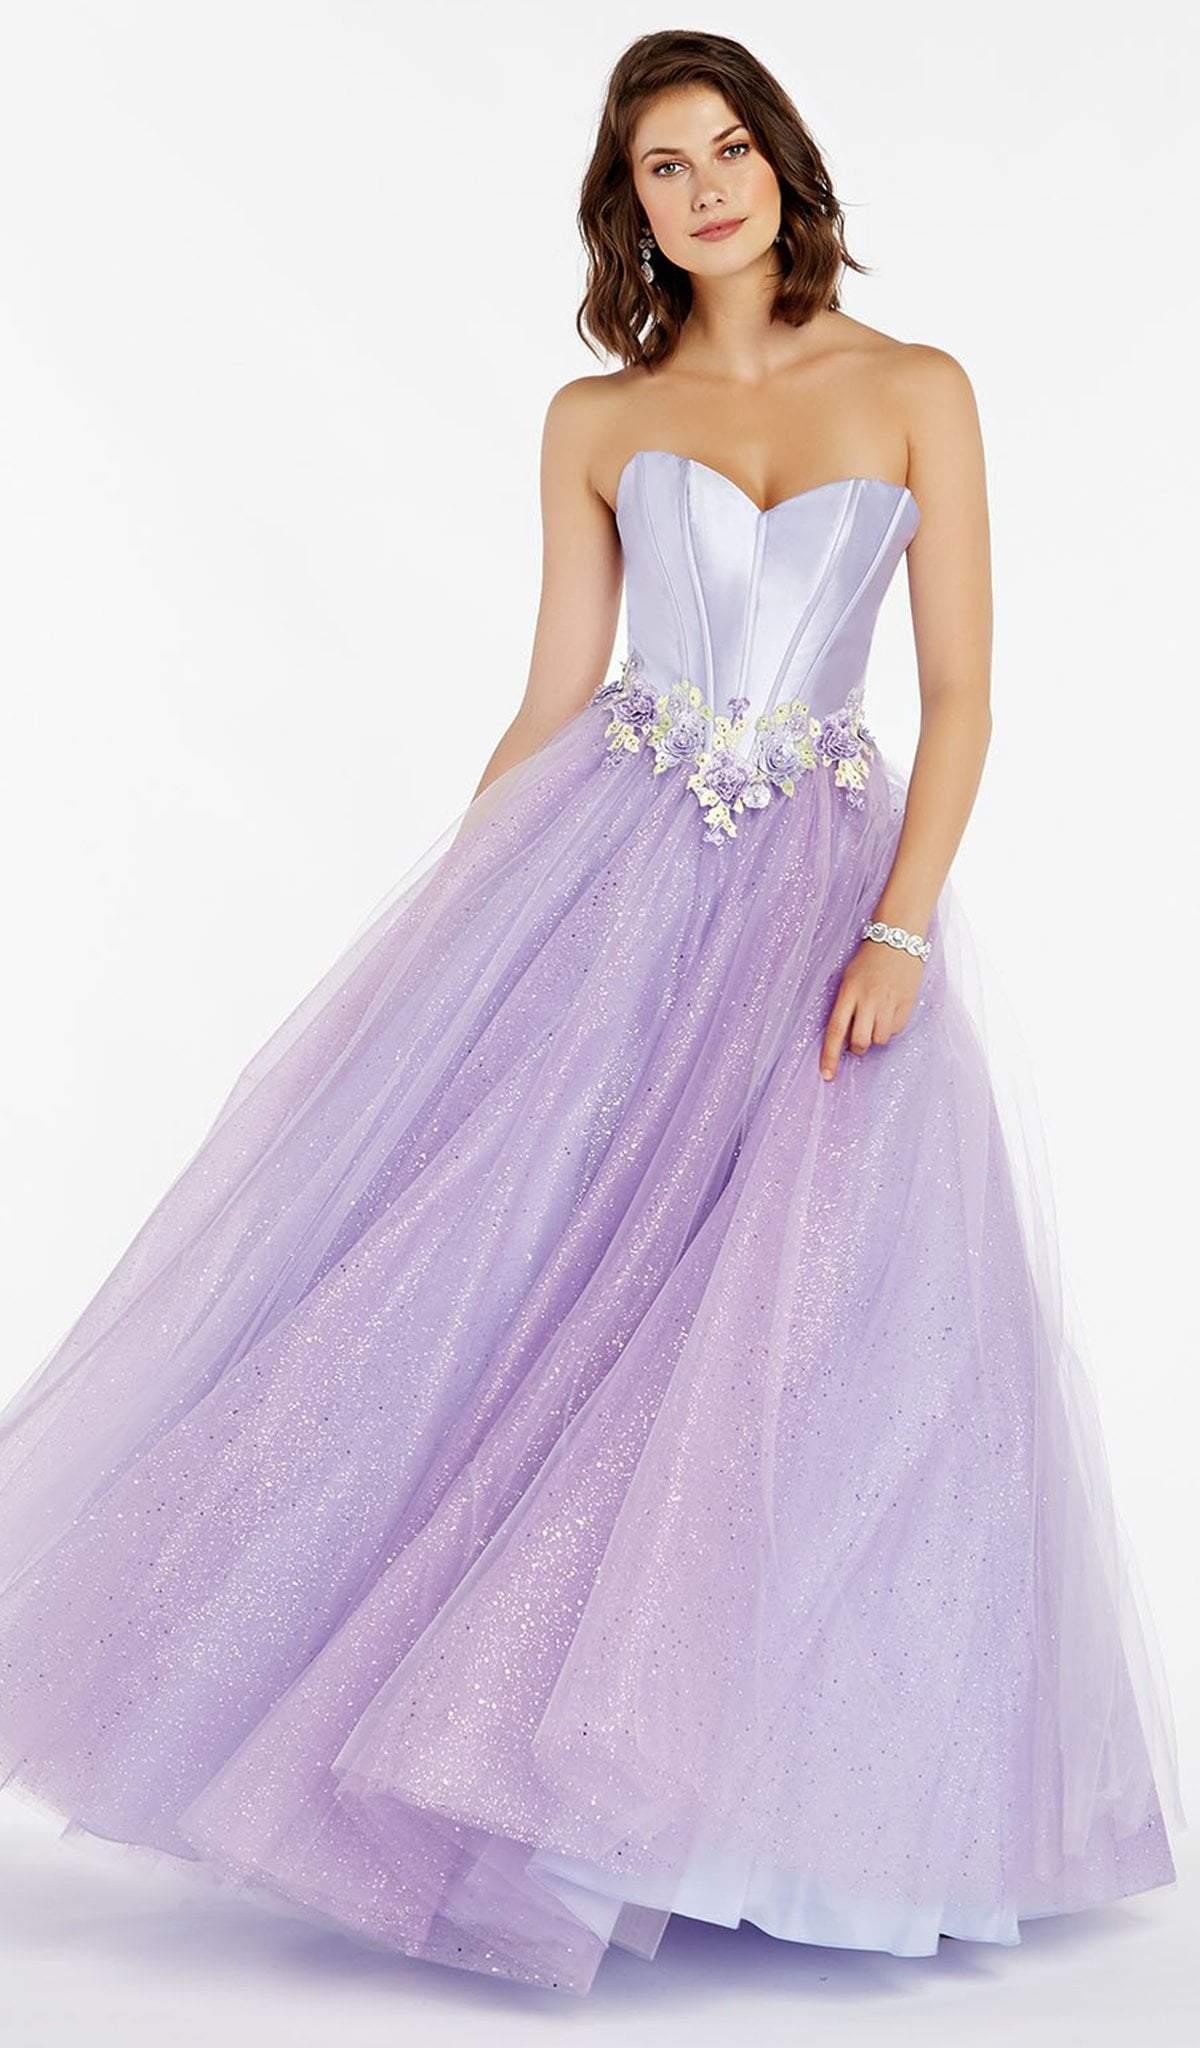 Alyce Paris - 60363 Mikado Sweetheart Floral Applique Tulle Ballgown